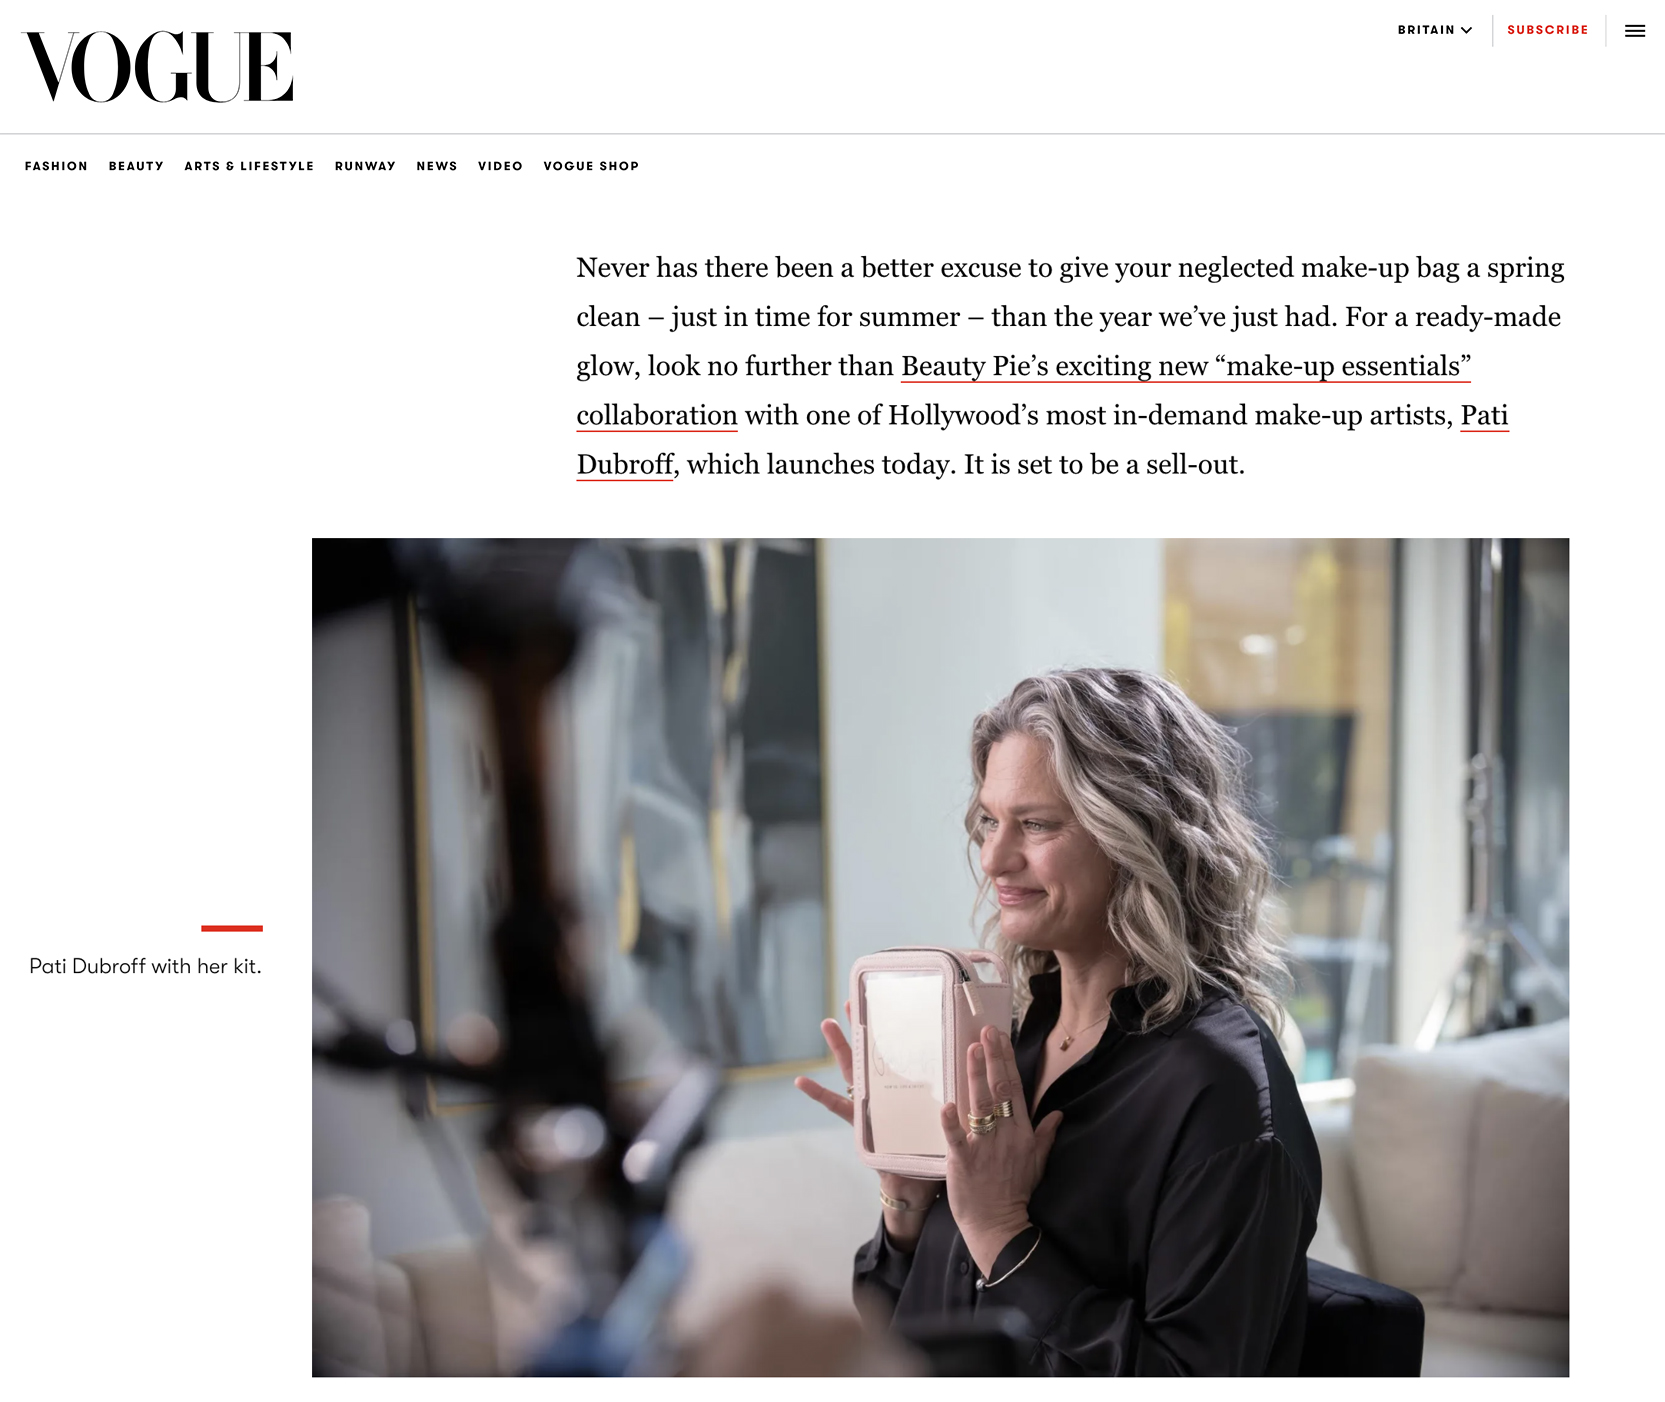 Pati Dubroff British Vogue Article For Instagram